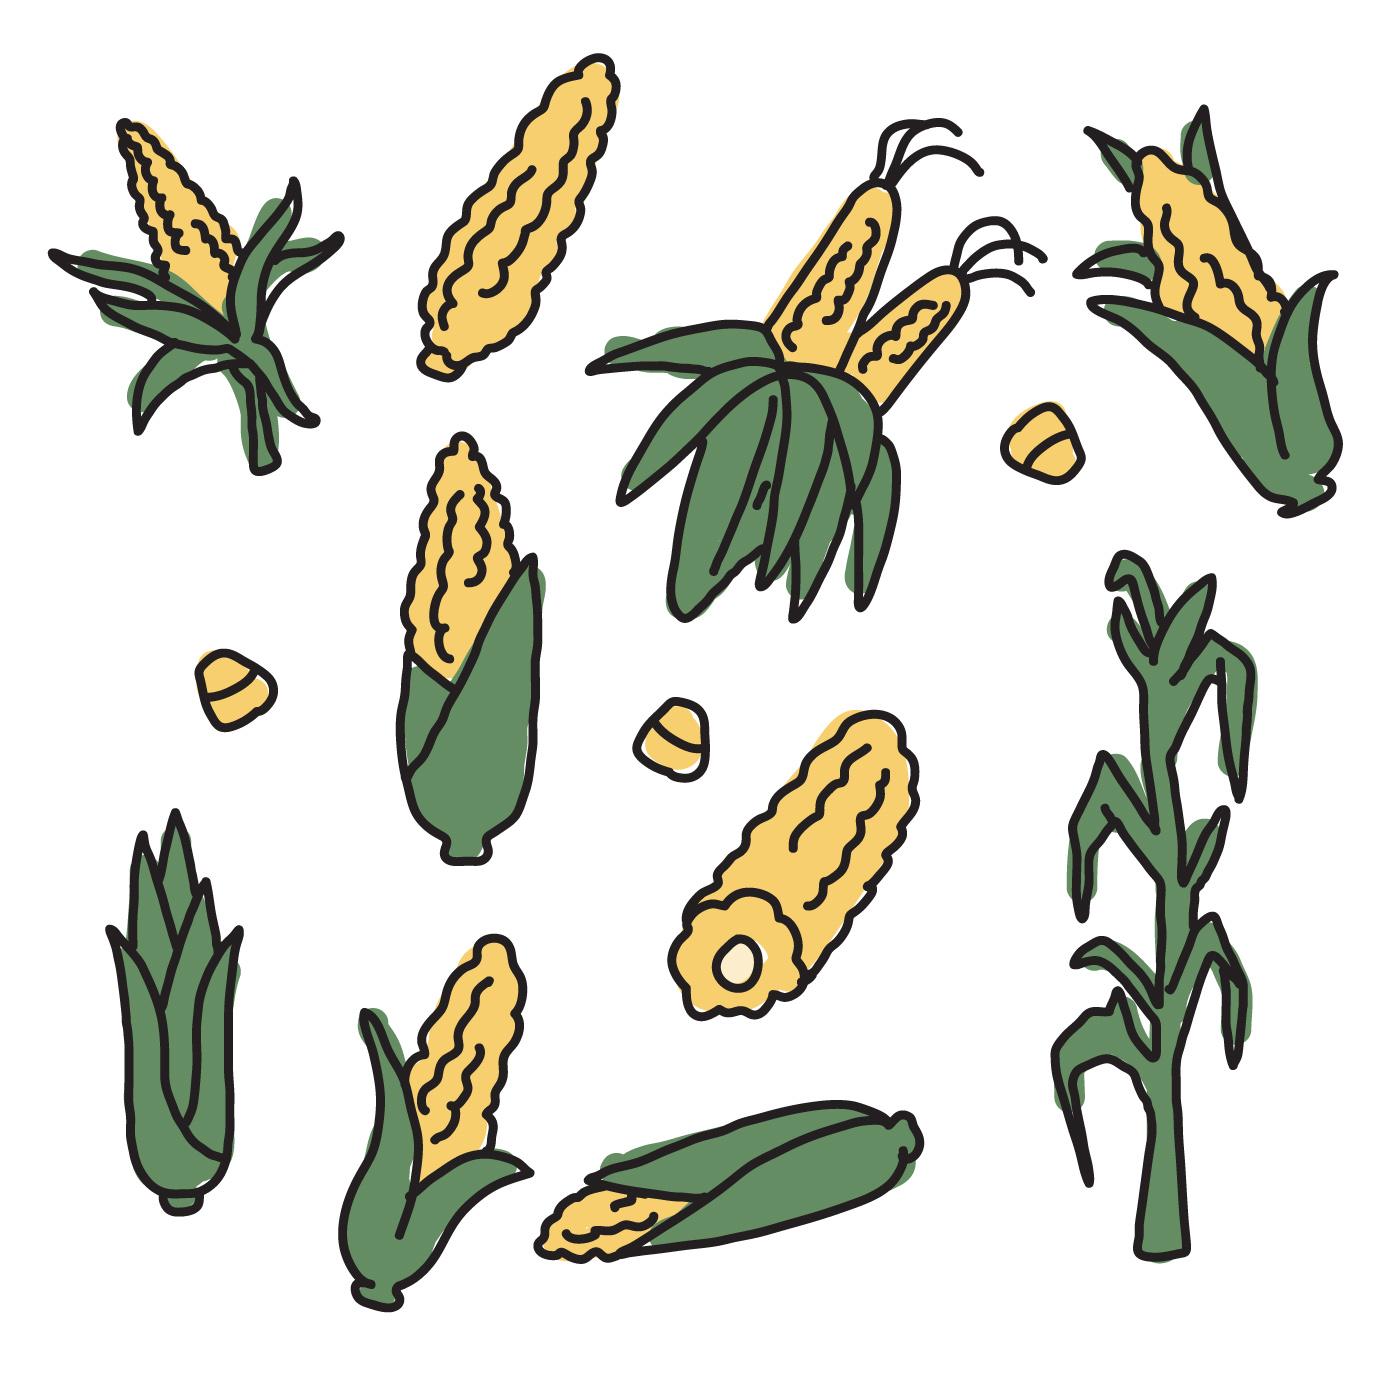 1400x1400 Corn Drawings